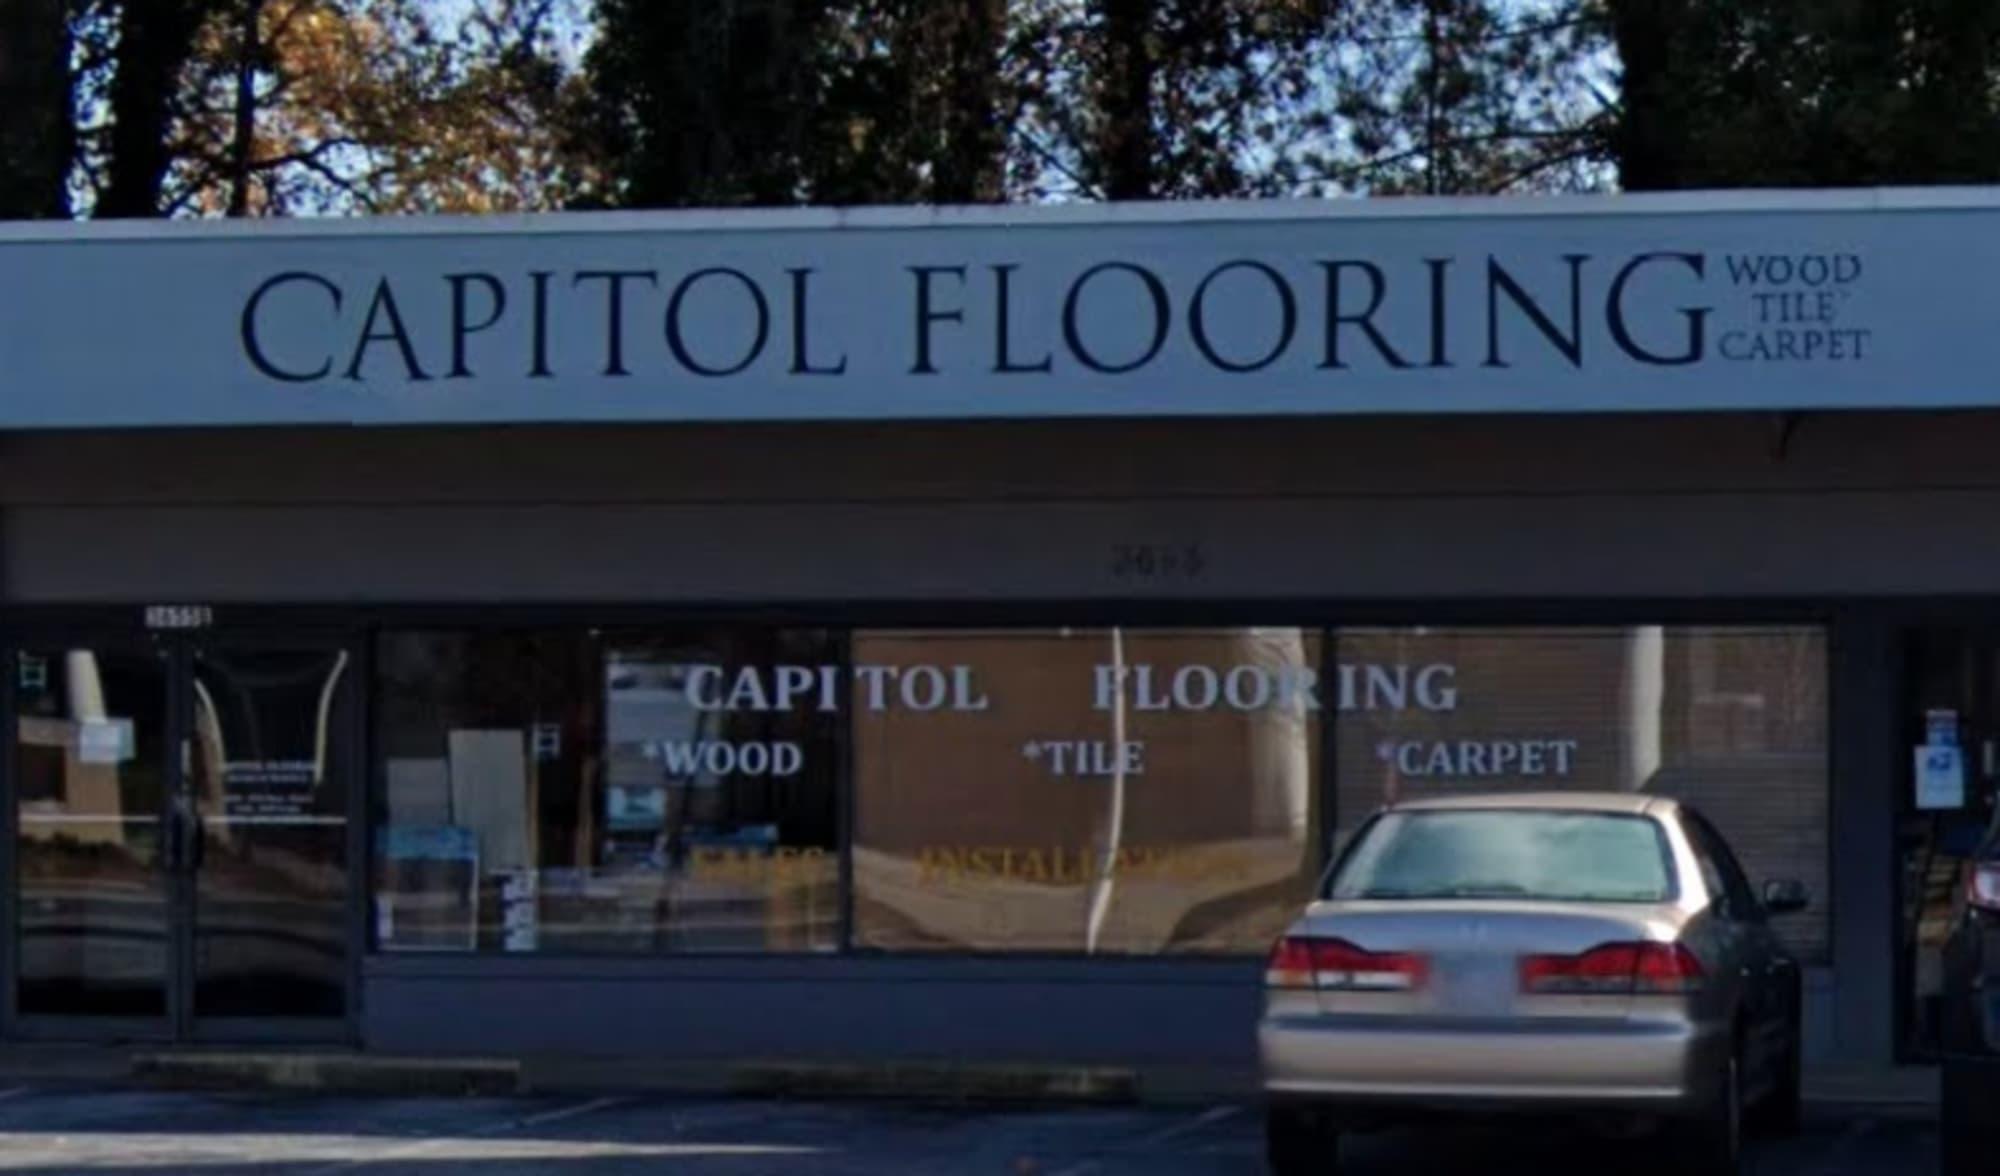 Capitol Flooring LLC - 3655b Chamblee Dunwoody Rd Chamblee, GA 30341